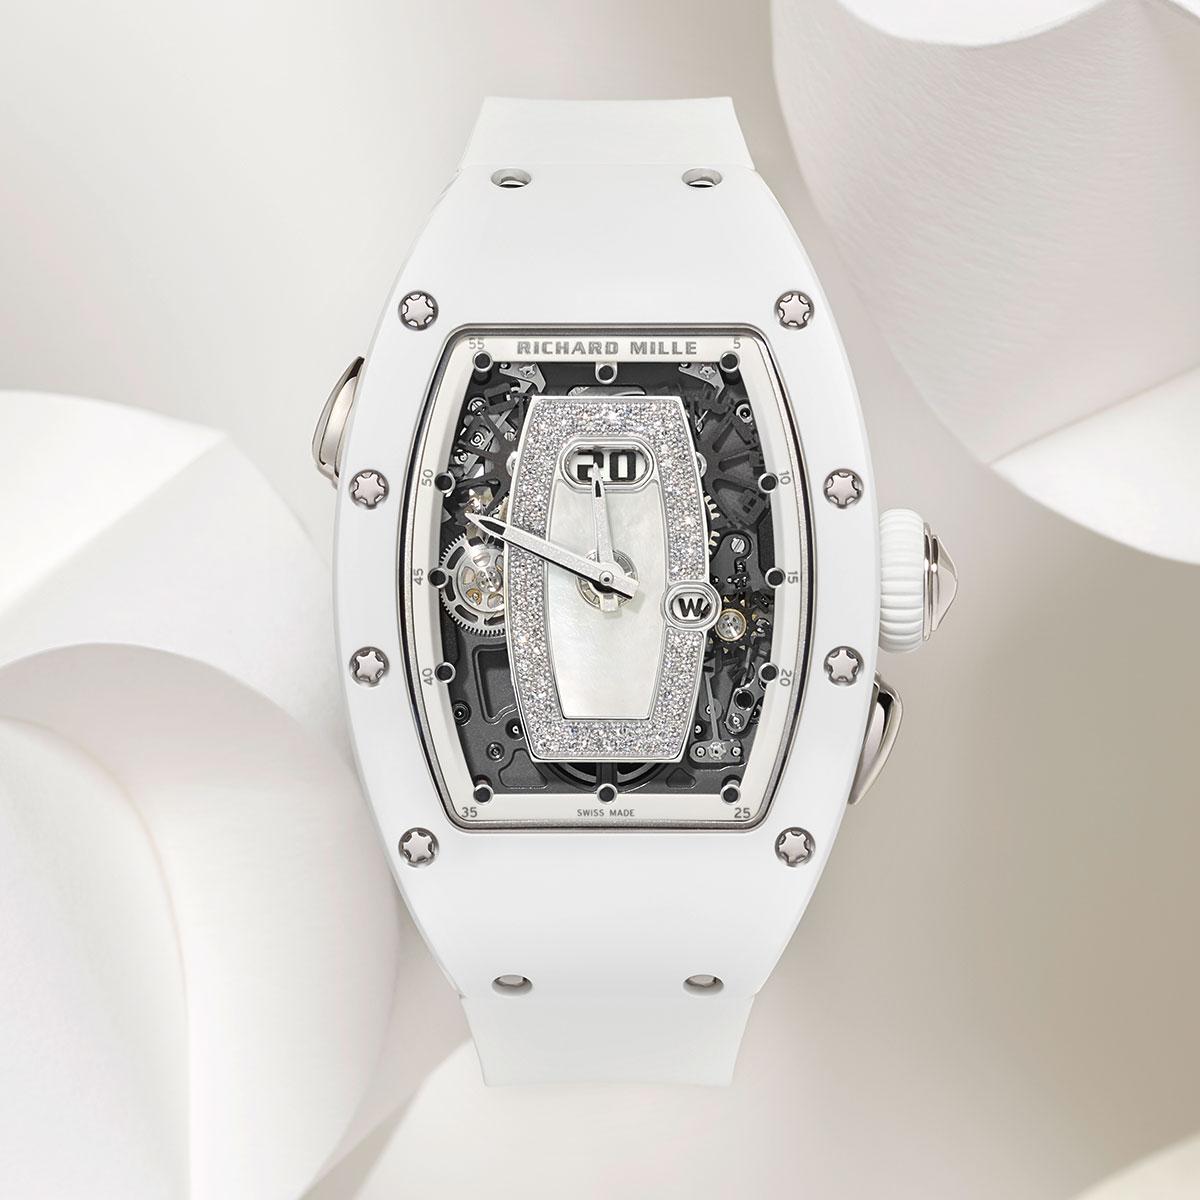 Đồng hồ Richard Mille RM 037 White Ceramic Automatic